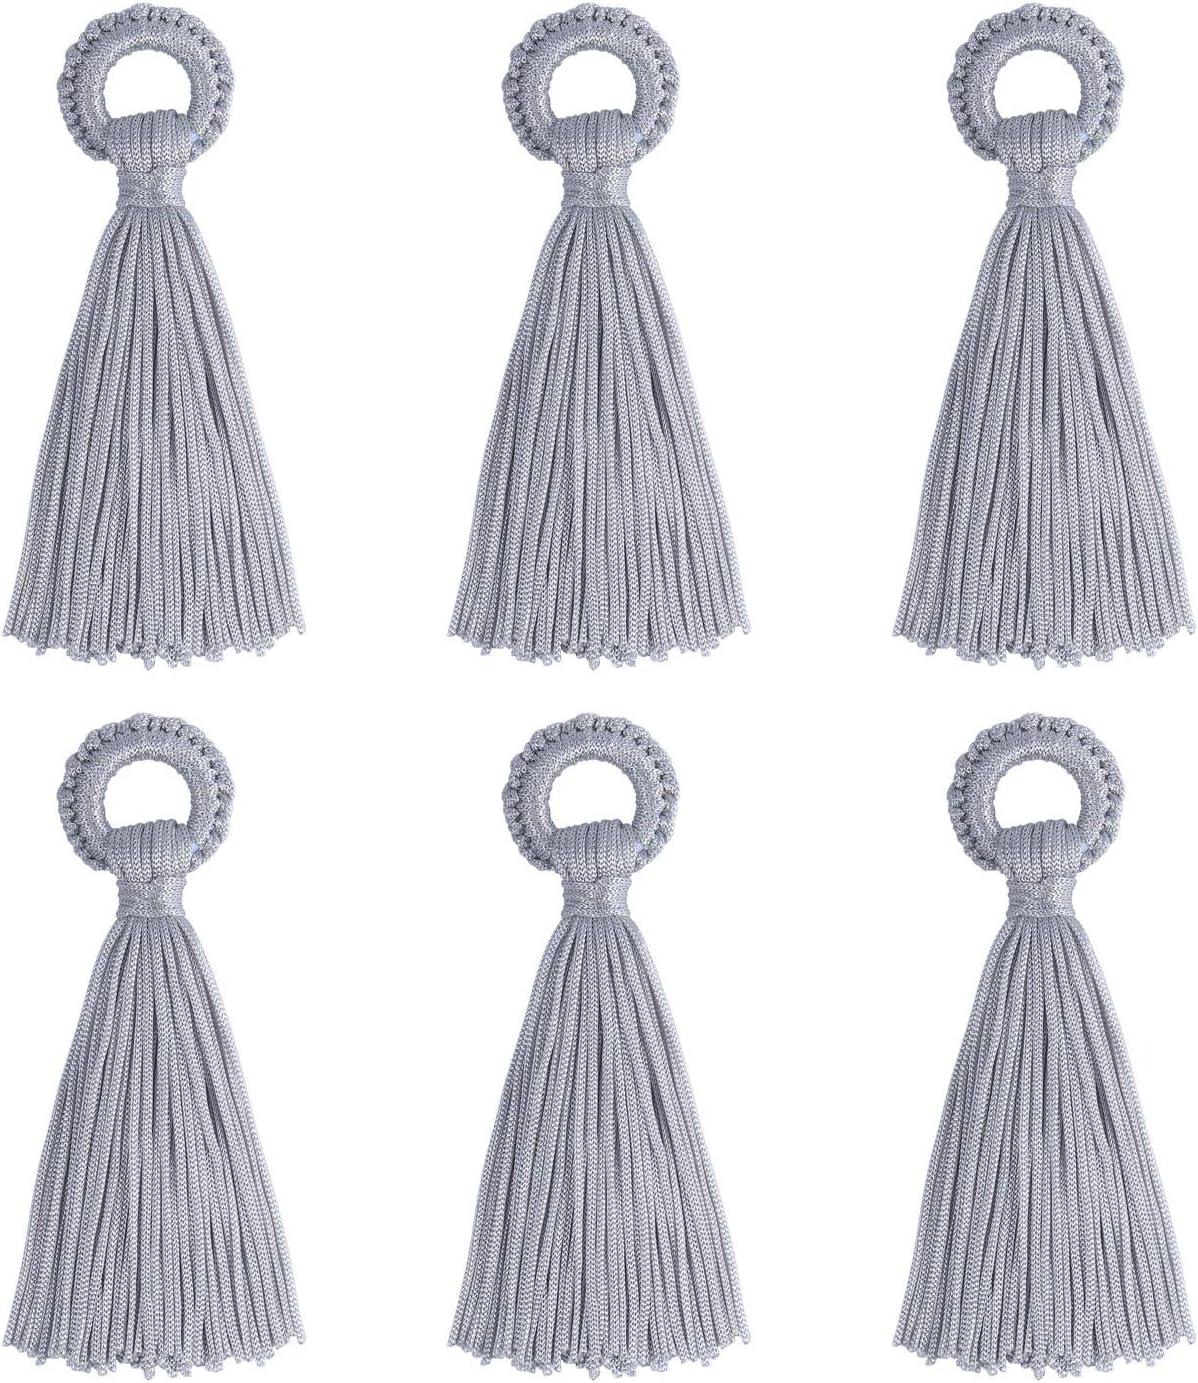 Wholesale 12 PCS Craft Tassels Handmade Soft Silk Large Tassel Bulk for DIY and Jewelry Making(6 Pairs)